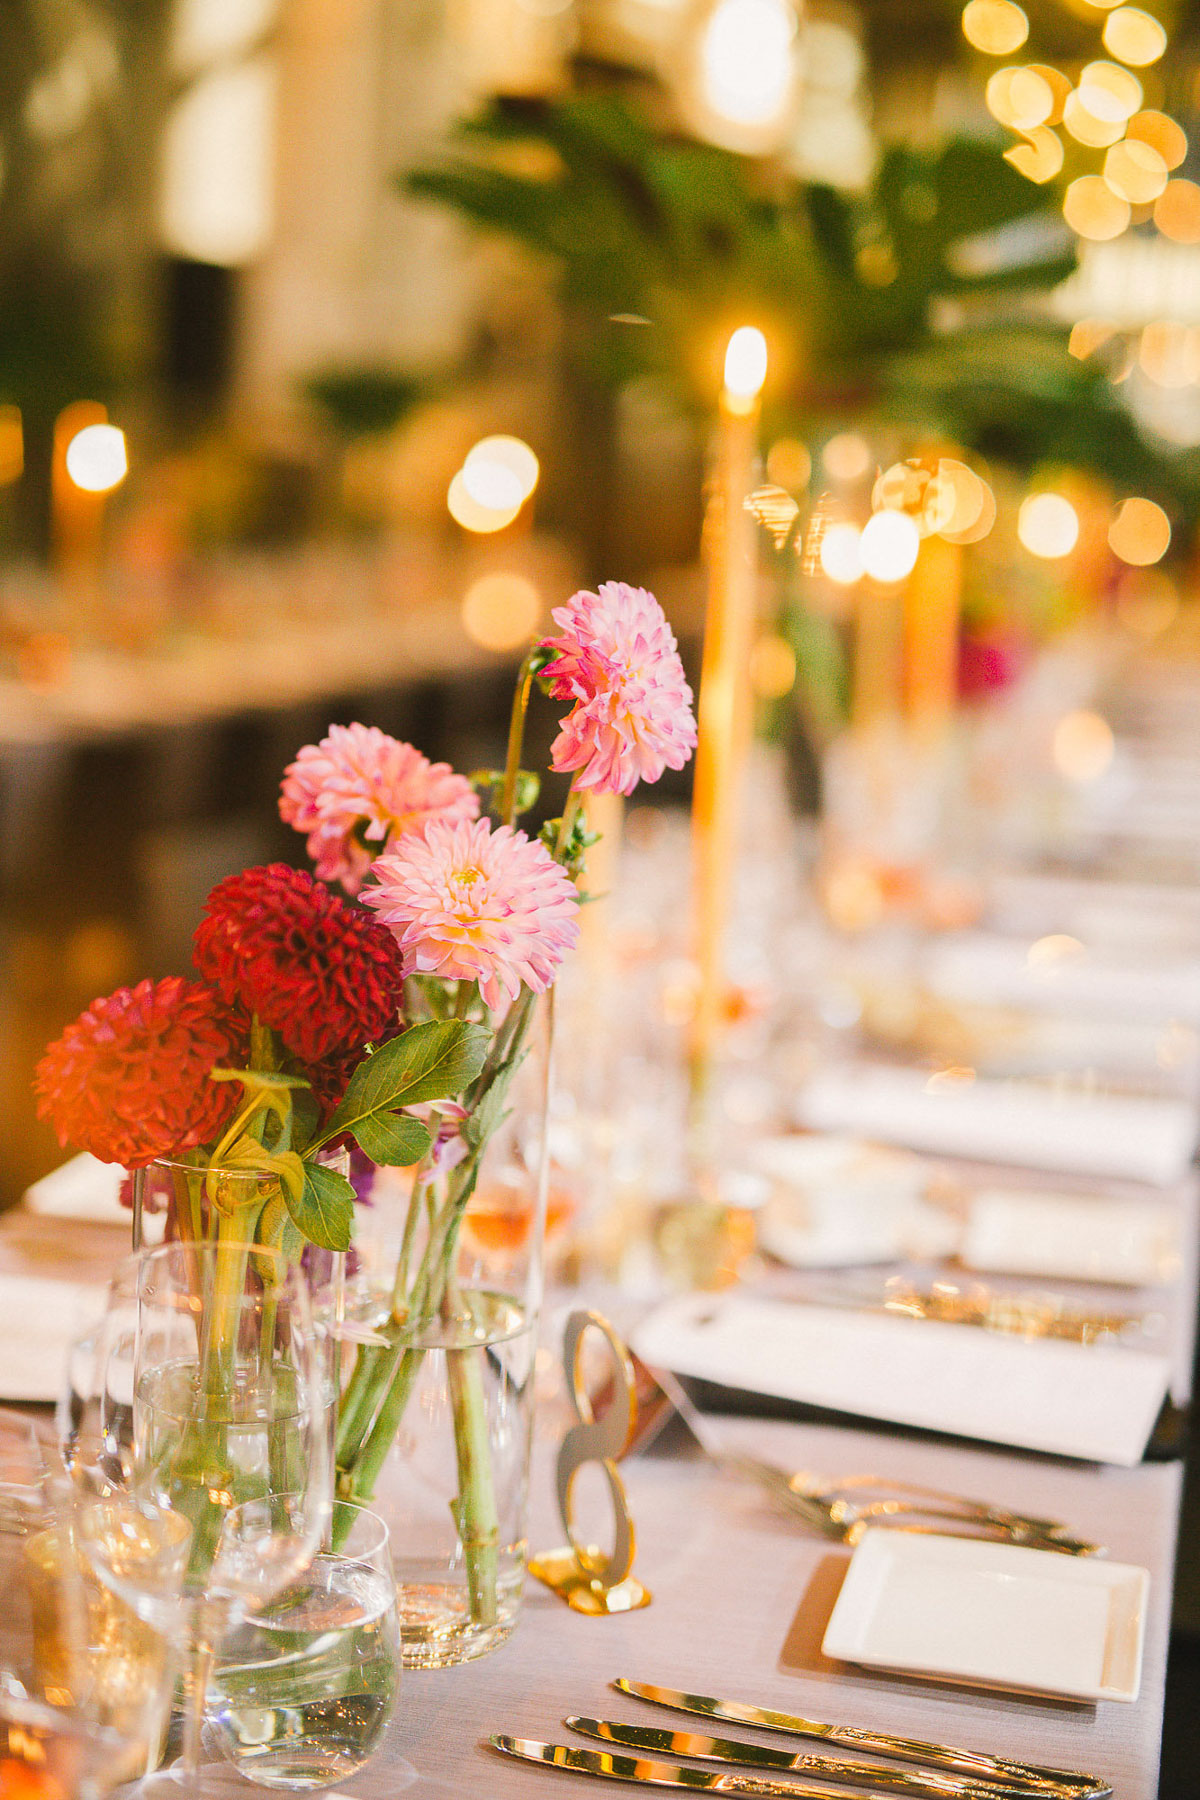 julia-park-photography-vineyard-bride-swish-list-stratus-winery-niagara-on-the-lake-wedding-16.jpg